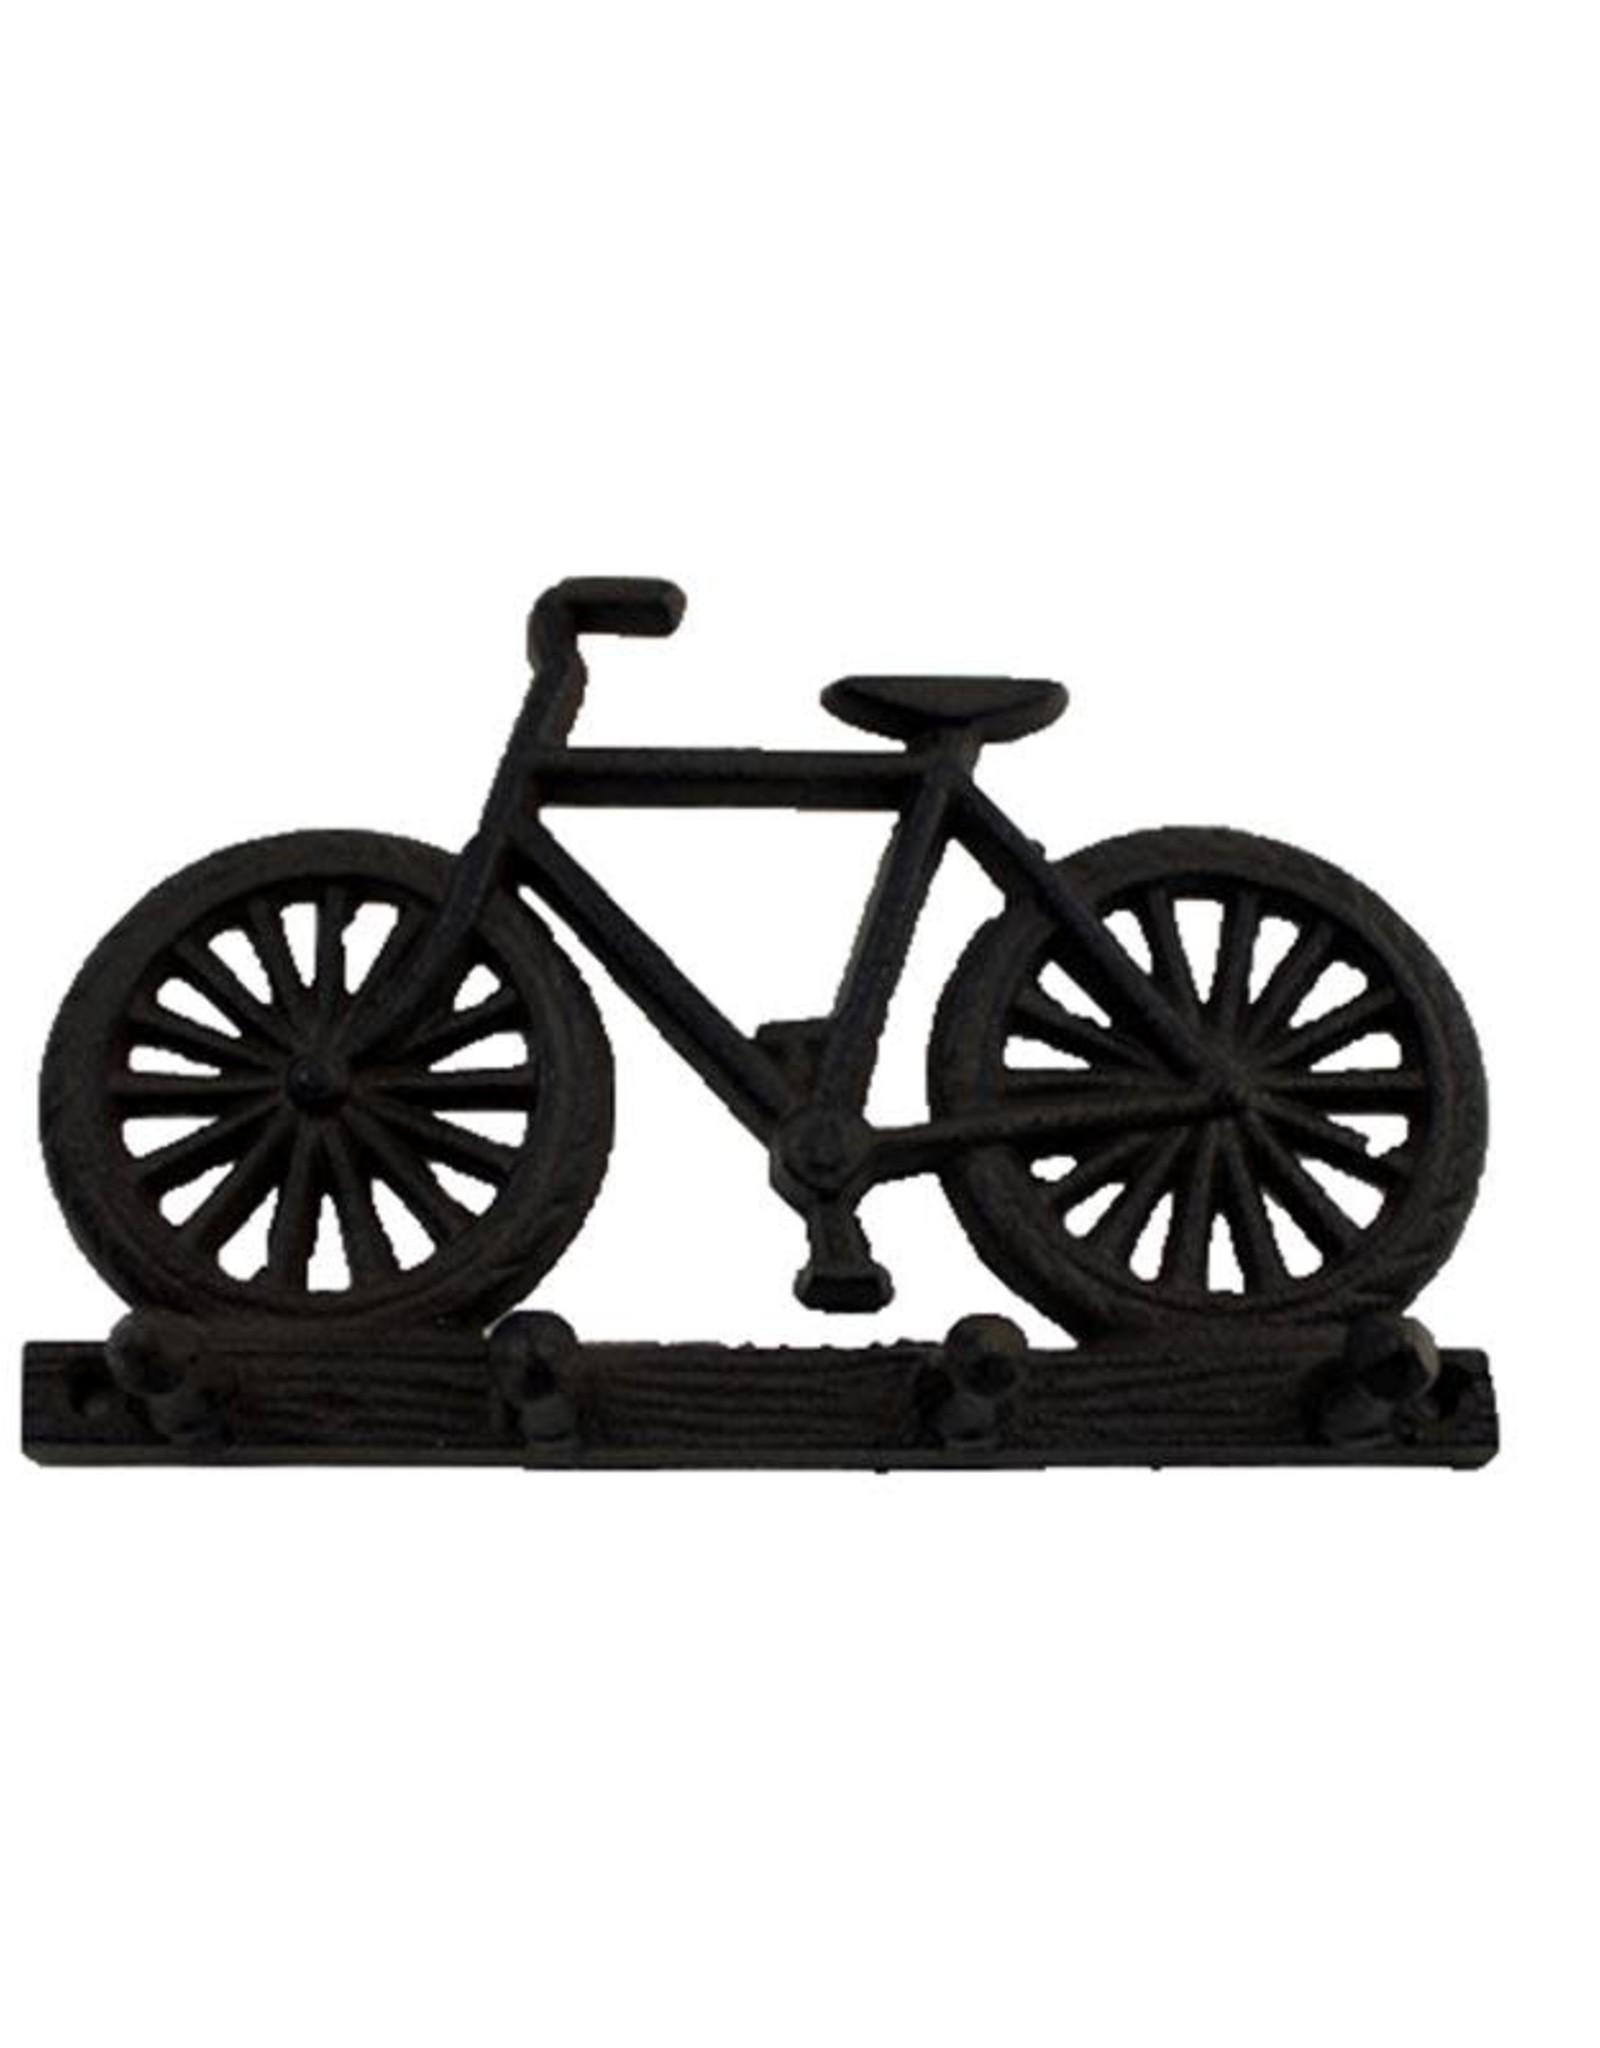 Cast Iron Bicycle Key Rack